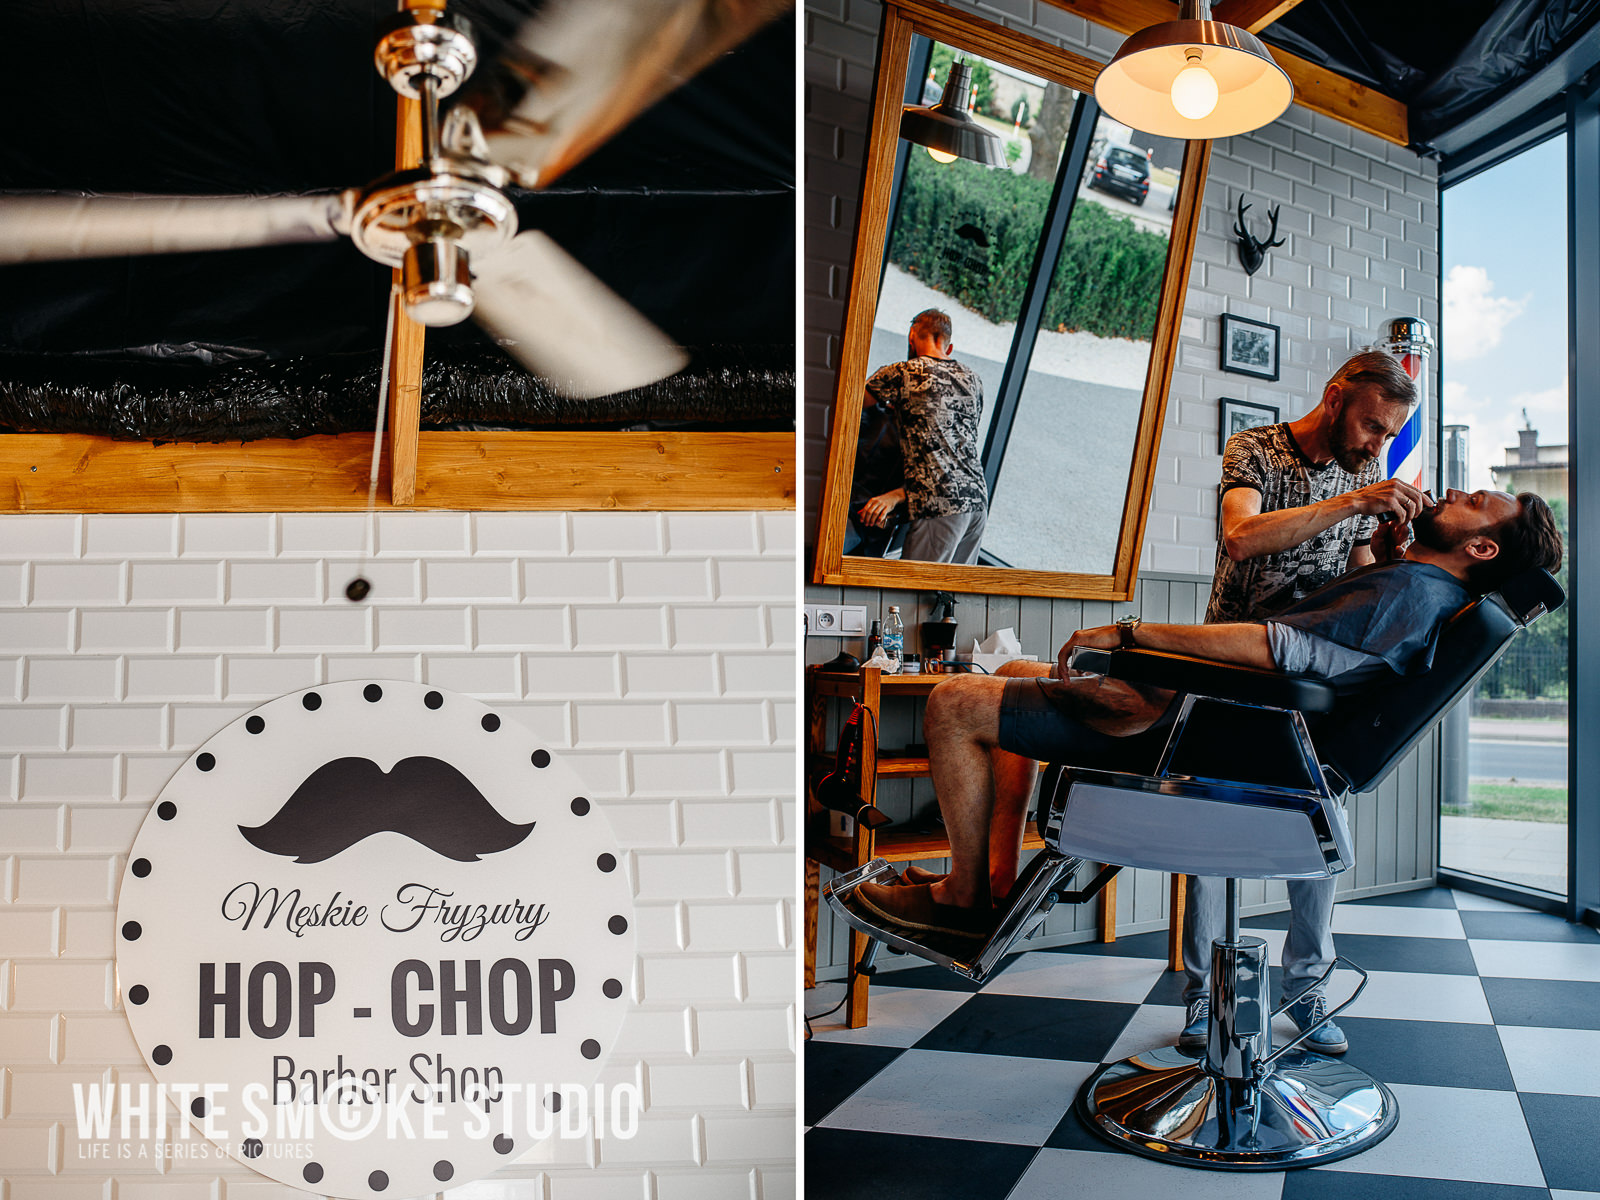 Kasia_Artur_006_hopchop_barbershop